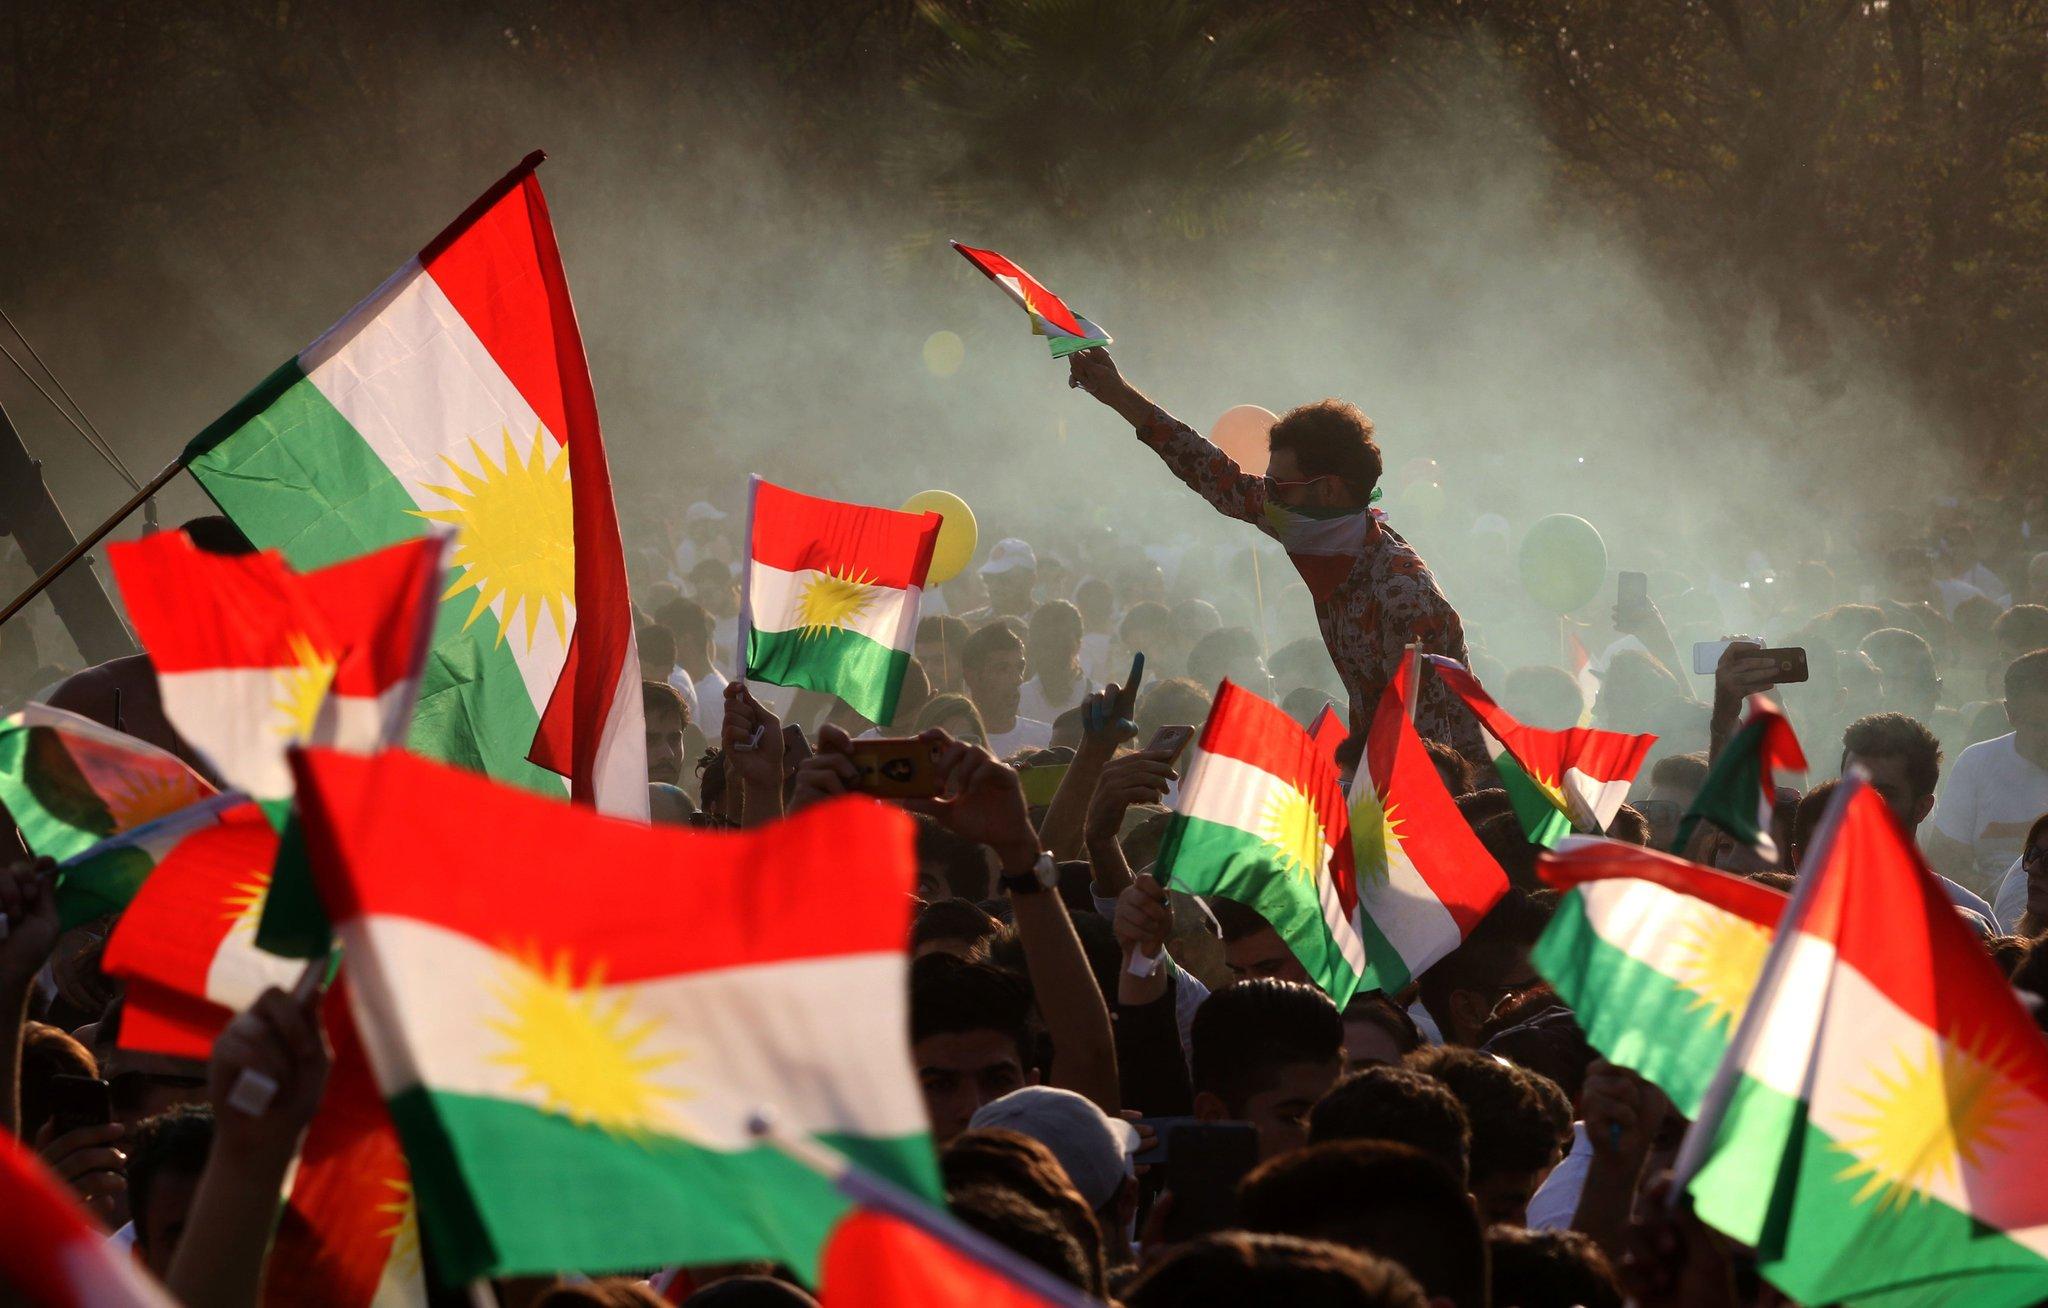 Photo: Flags waving as a Kurdish nationalist euphoria has swept Iraqi Kurdistan ahead of a referendum.  Photo Courtesy: NY Times, Safin Hamed/Agence France-Presse — Getty Images